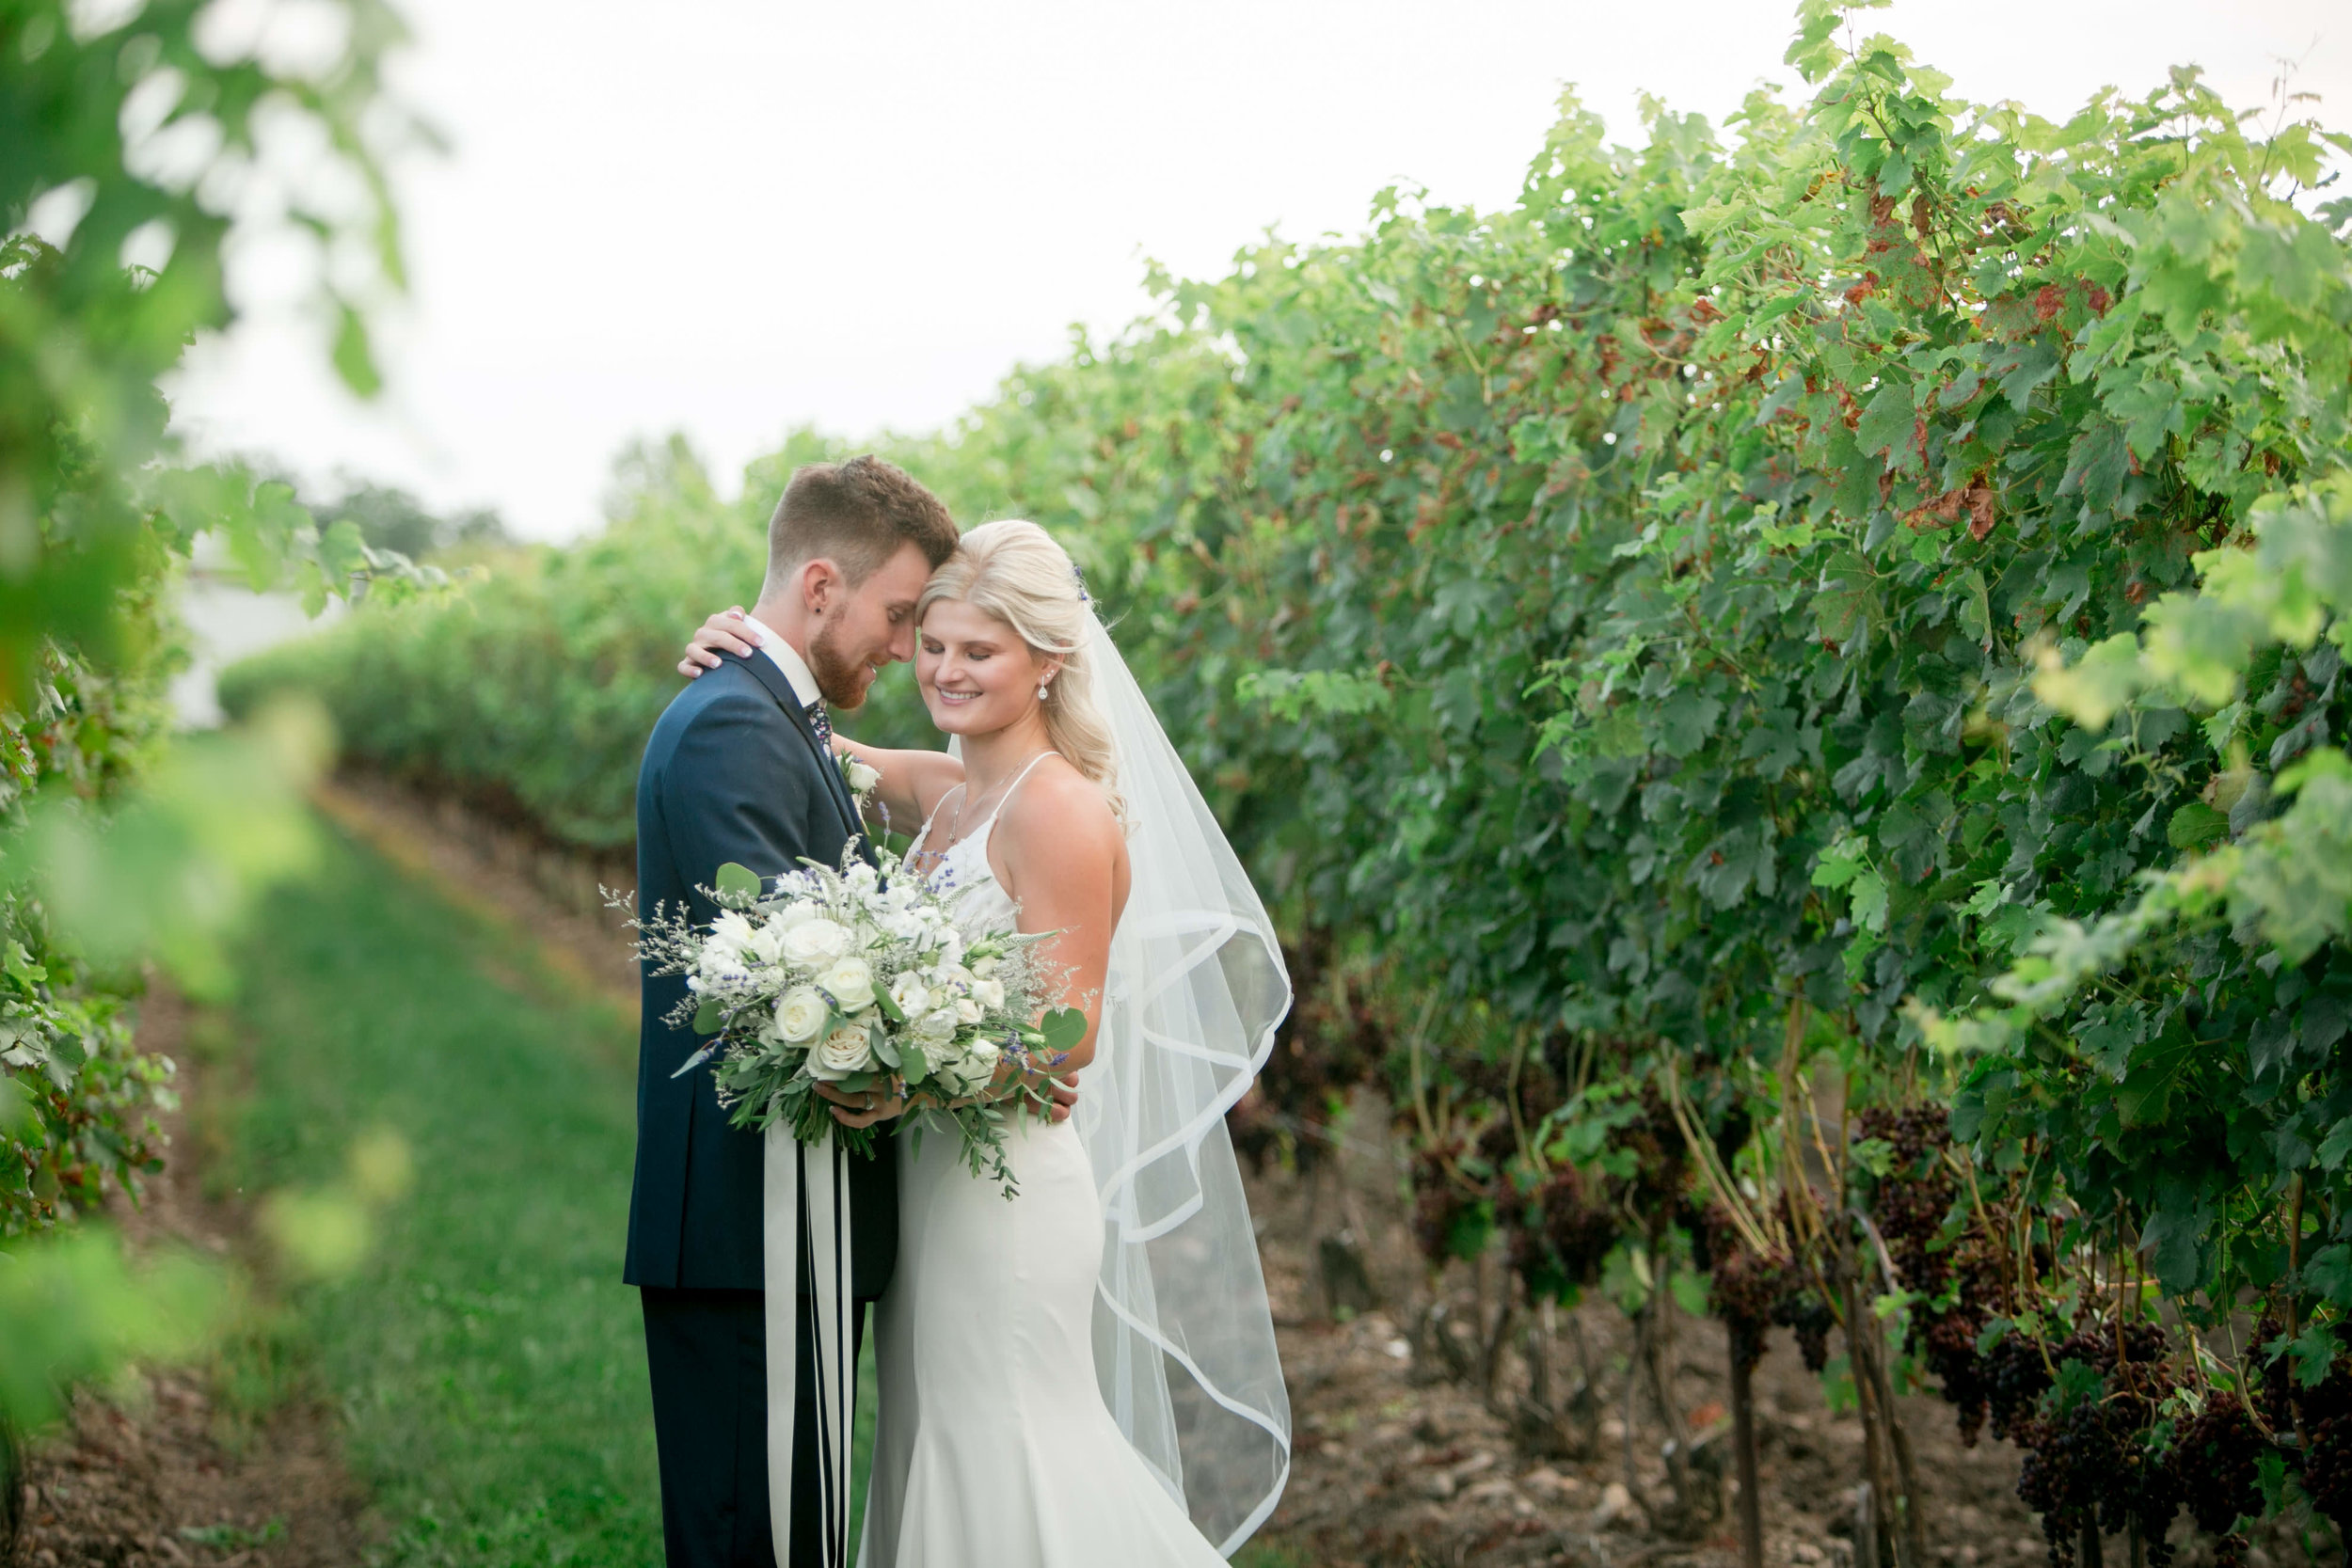 Maddy___Brandon___Daniel_Ricci_Weddings_High_Res._Finals_461.jpg